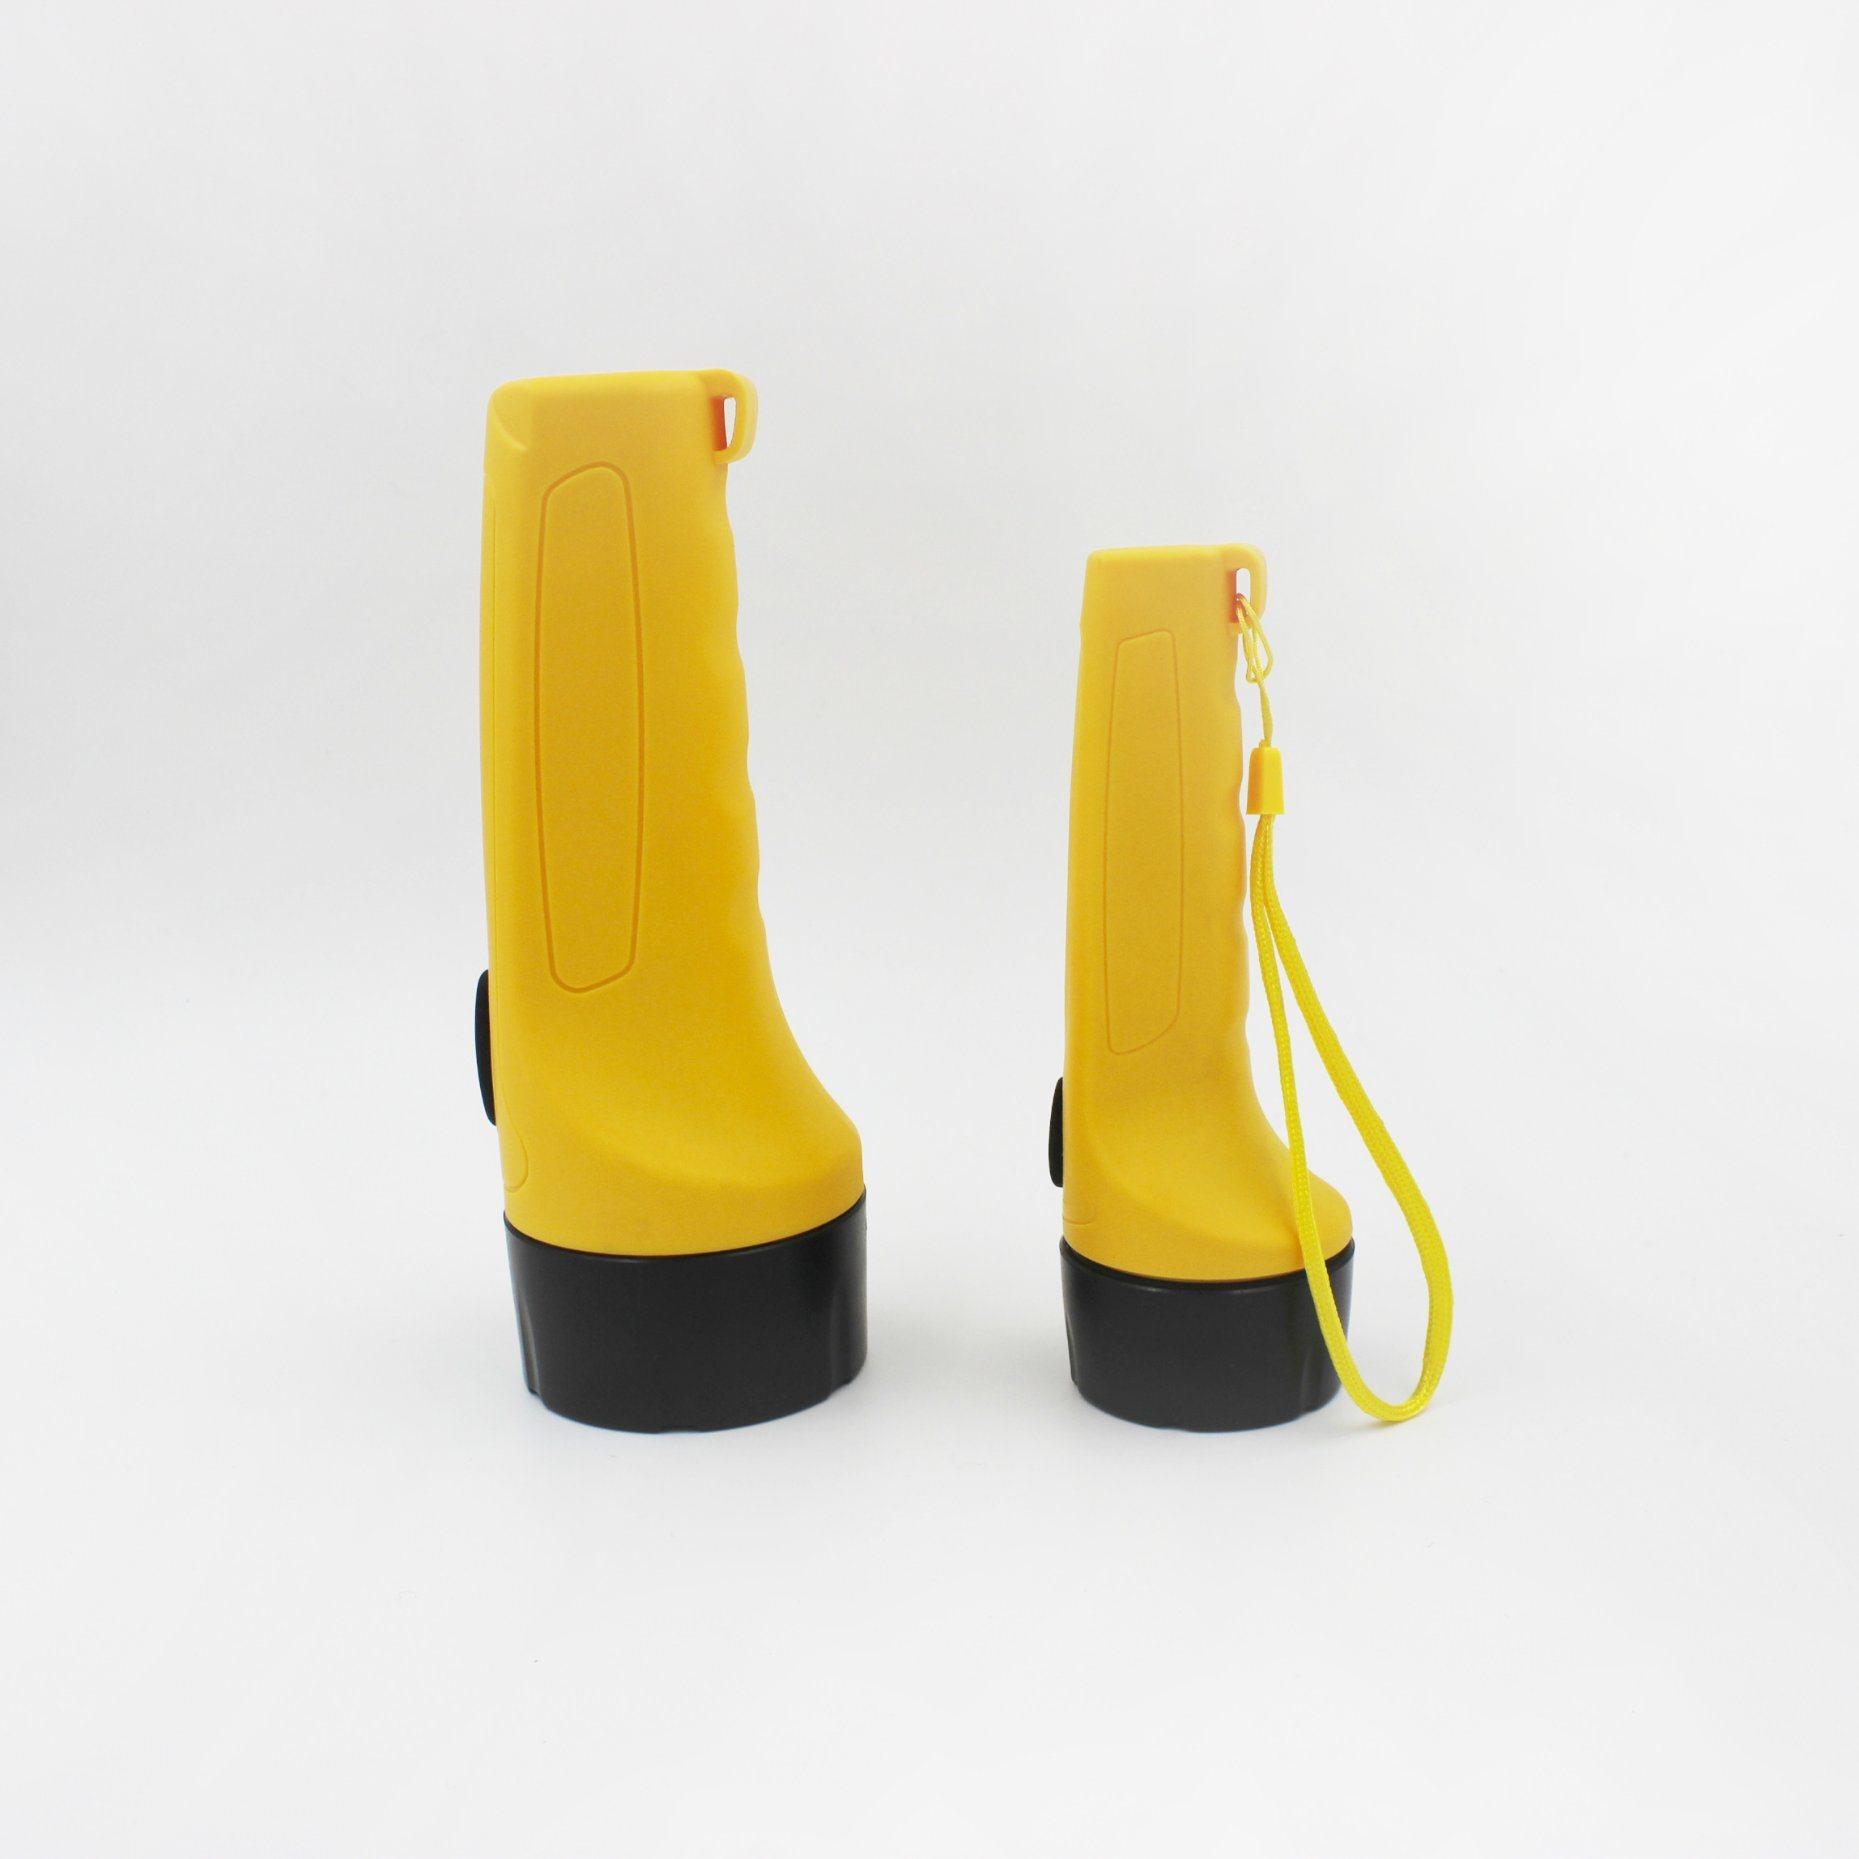 Two D1 IP67 Plastic Floating SMD LED Flashlight